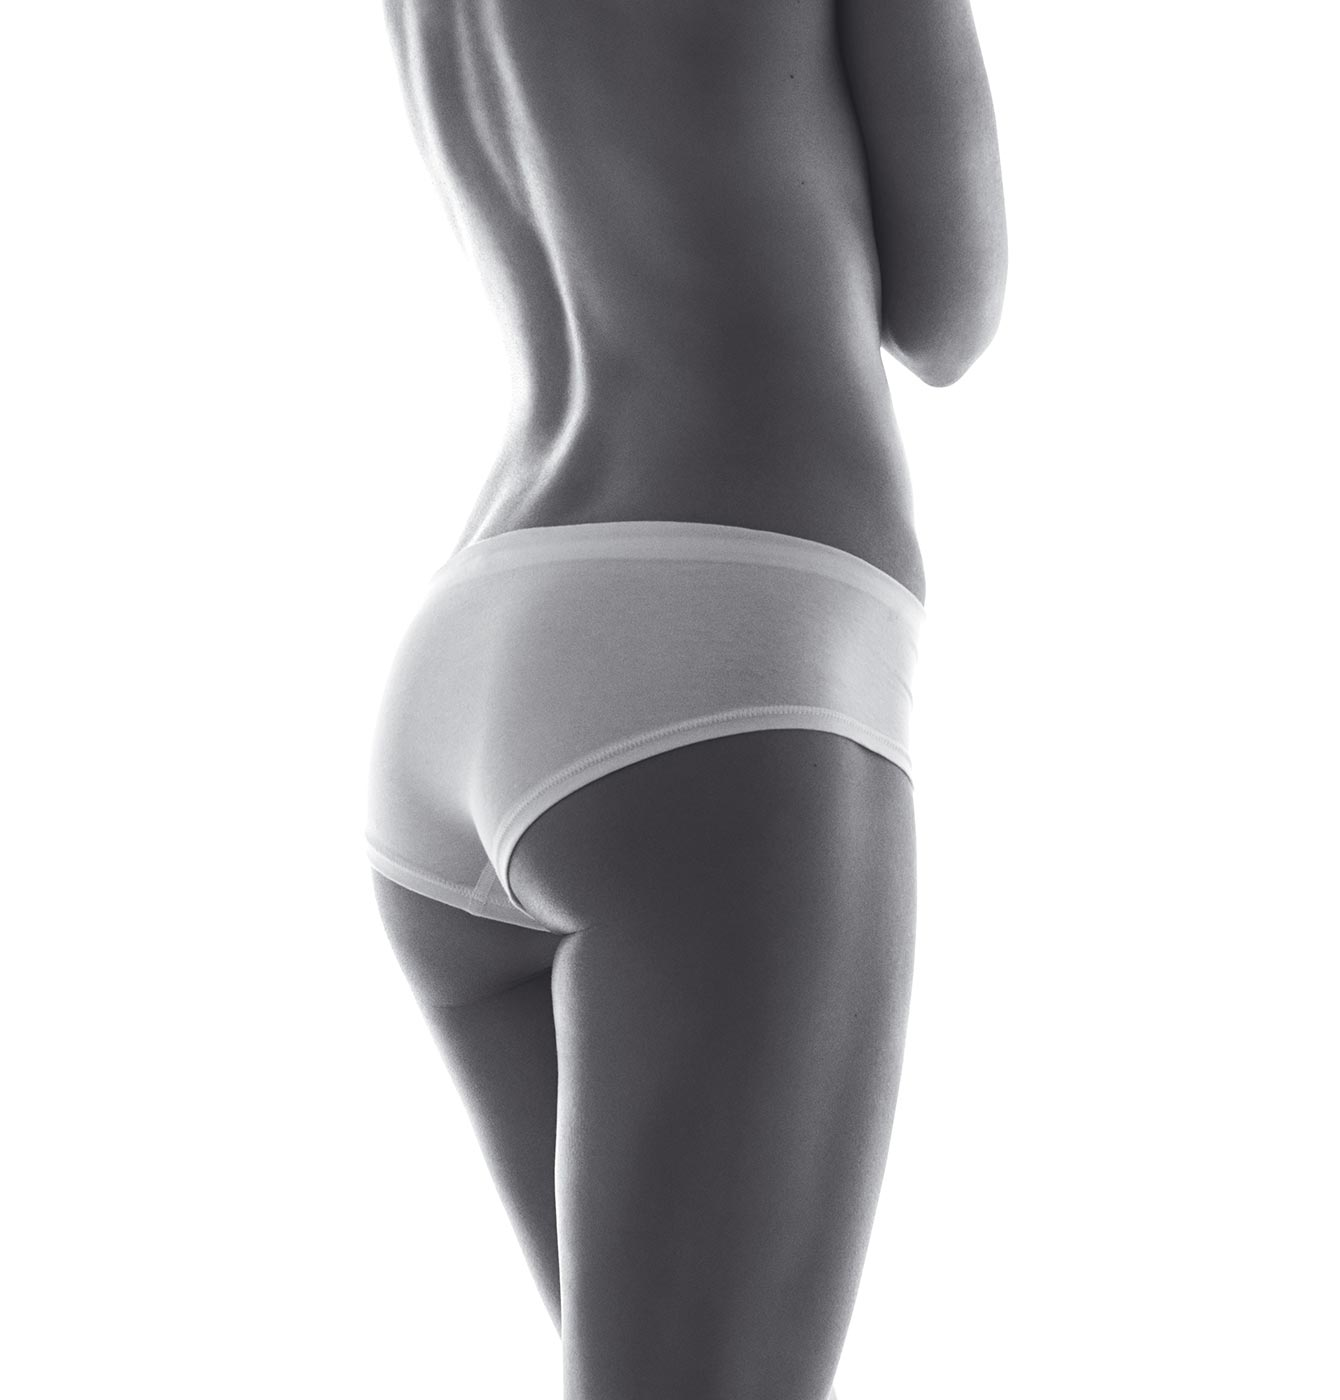 imagine corp femeie fara celulita